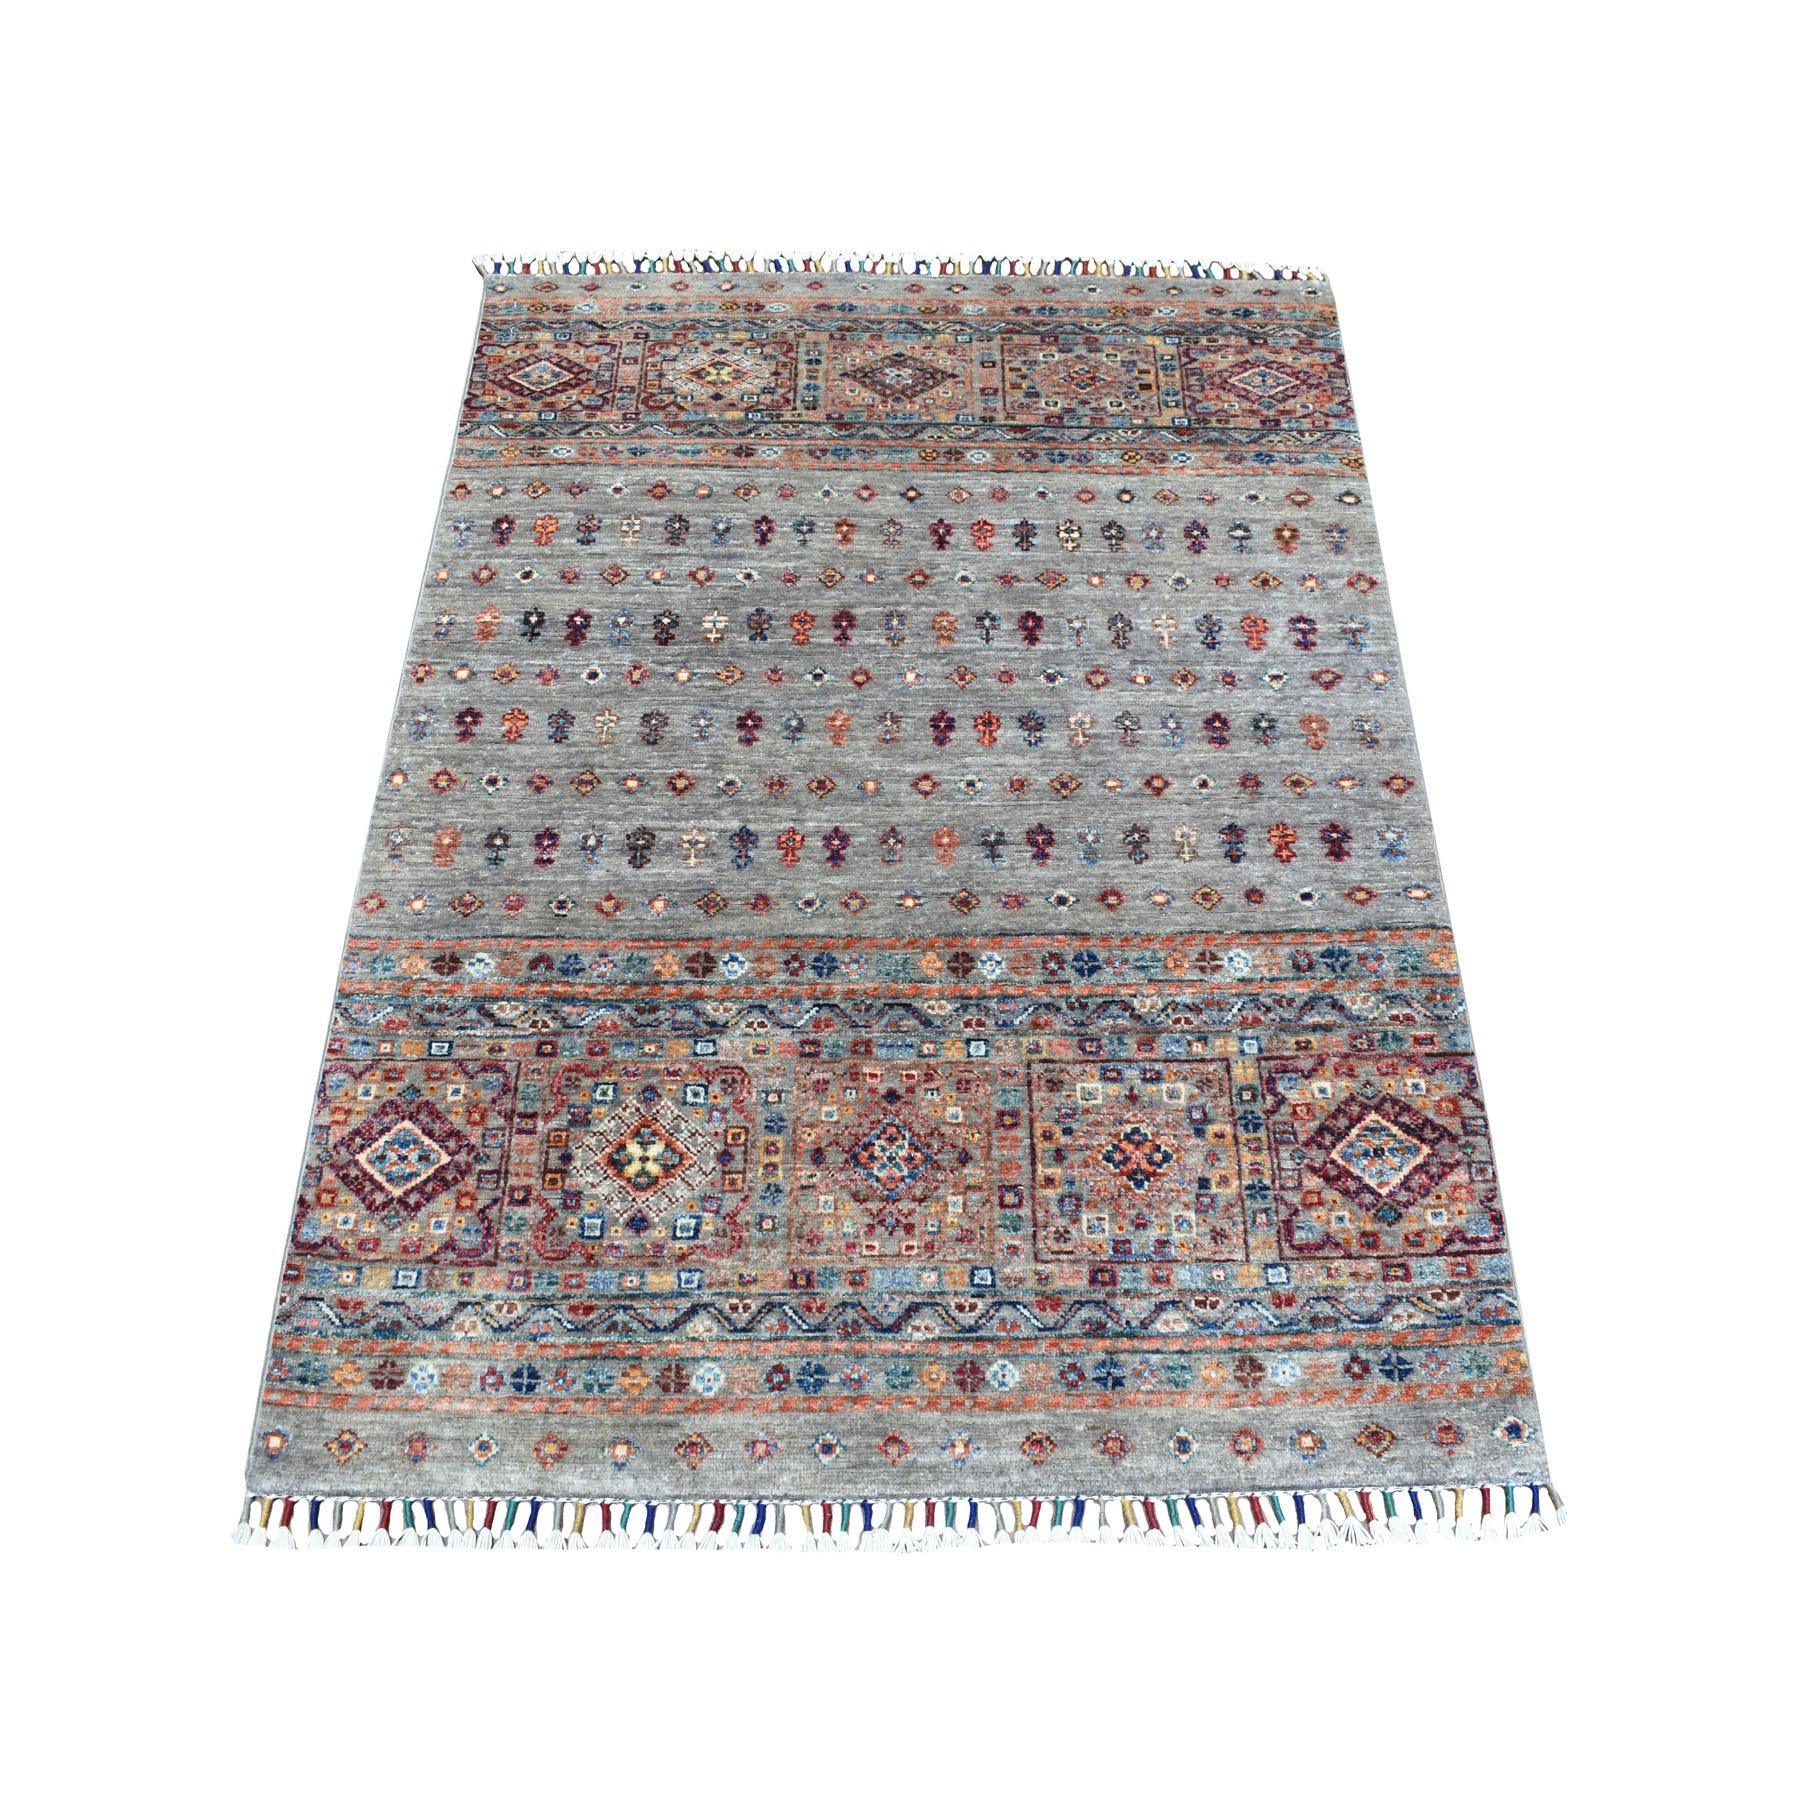 "3'3""x4'8"" Gray Khorjin Design Geometric Super Kazak Pure Wool Hand Knotted Oriental Rug"